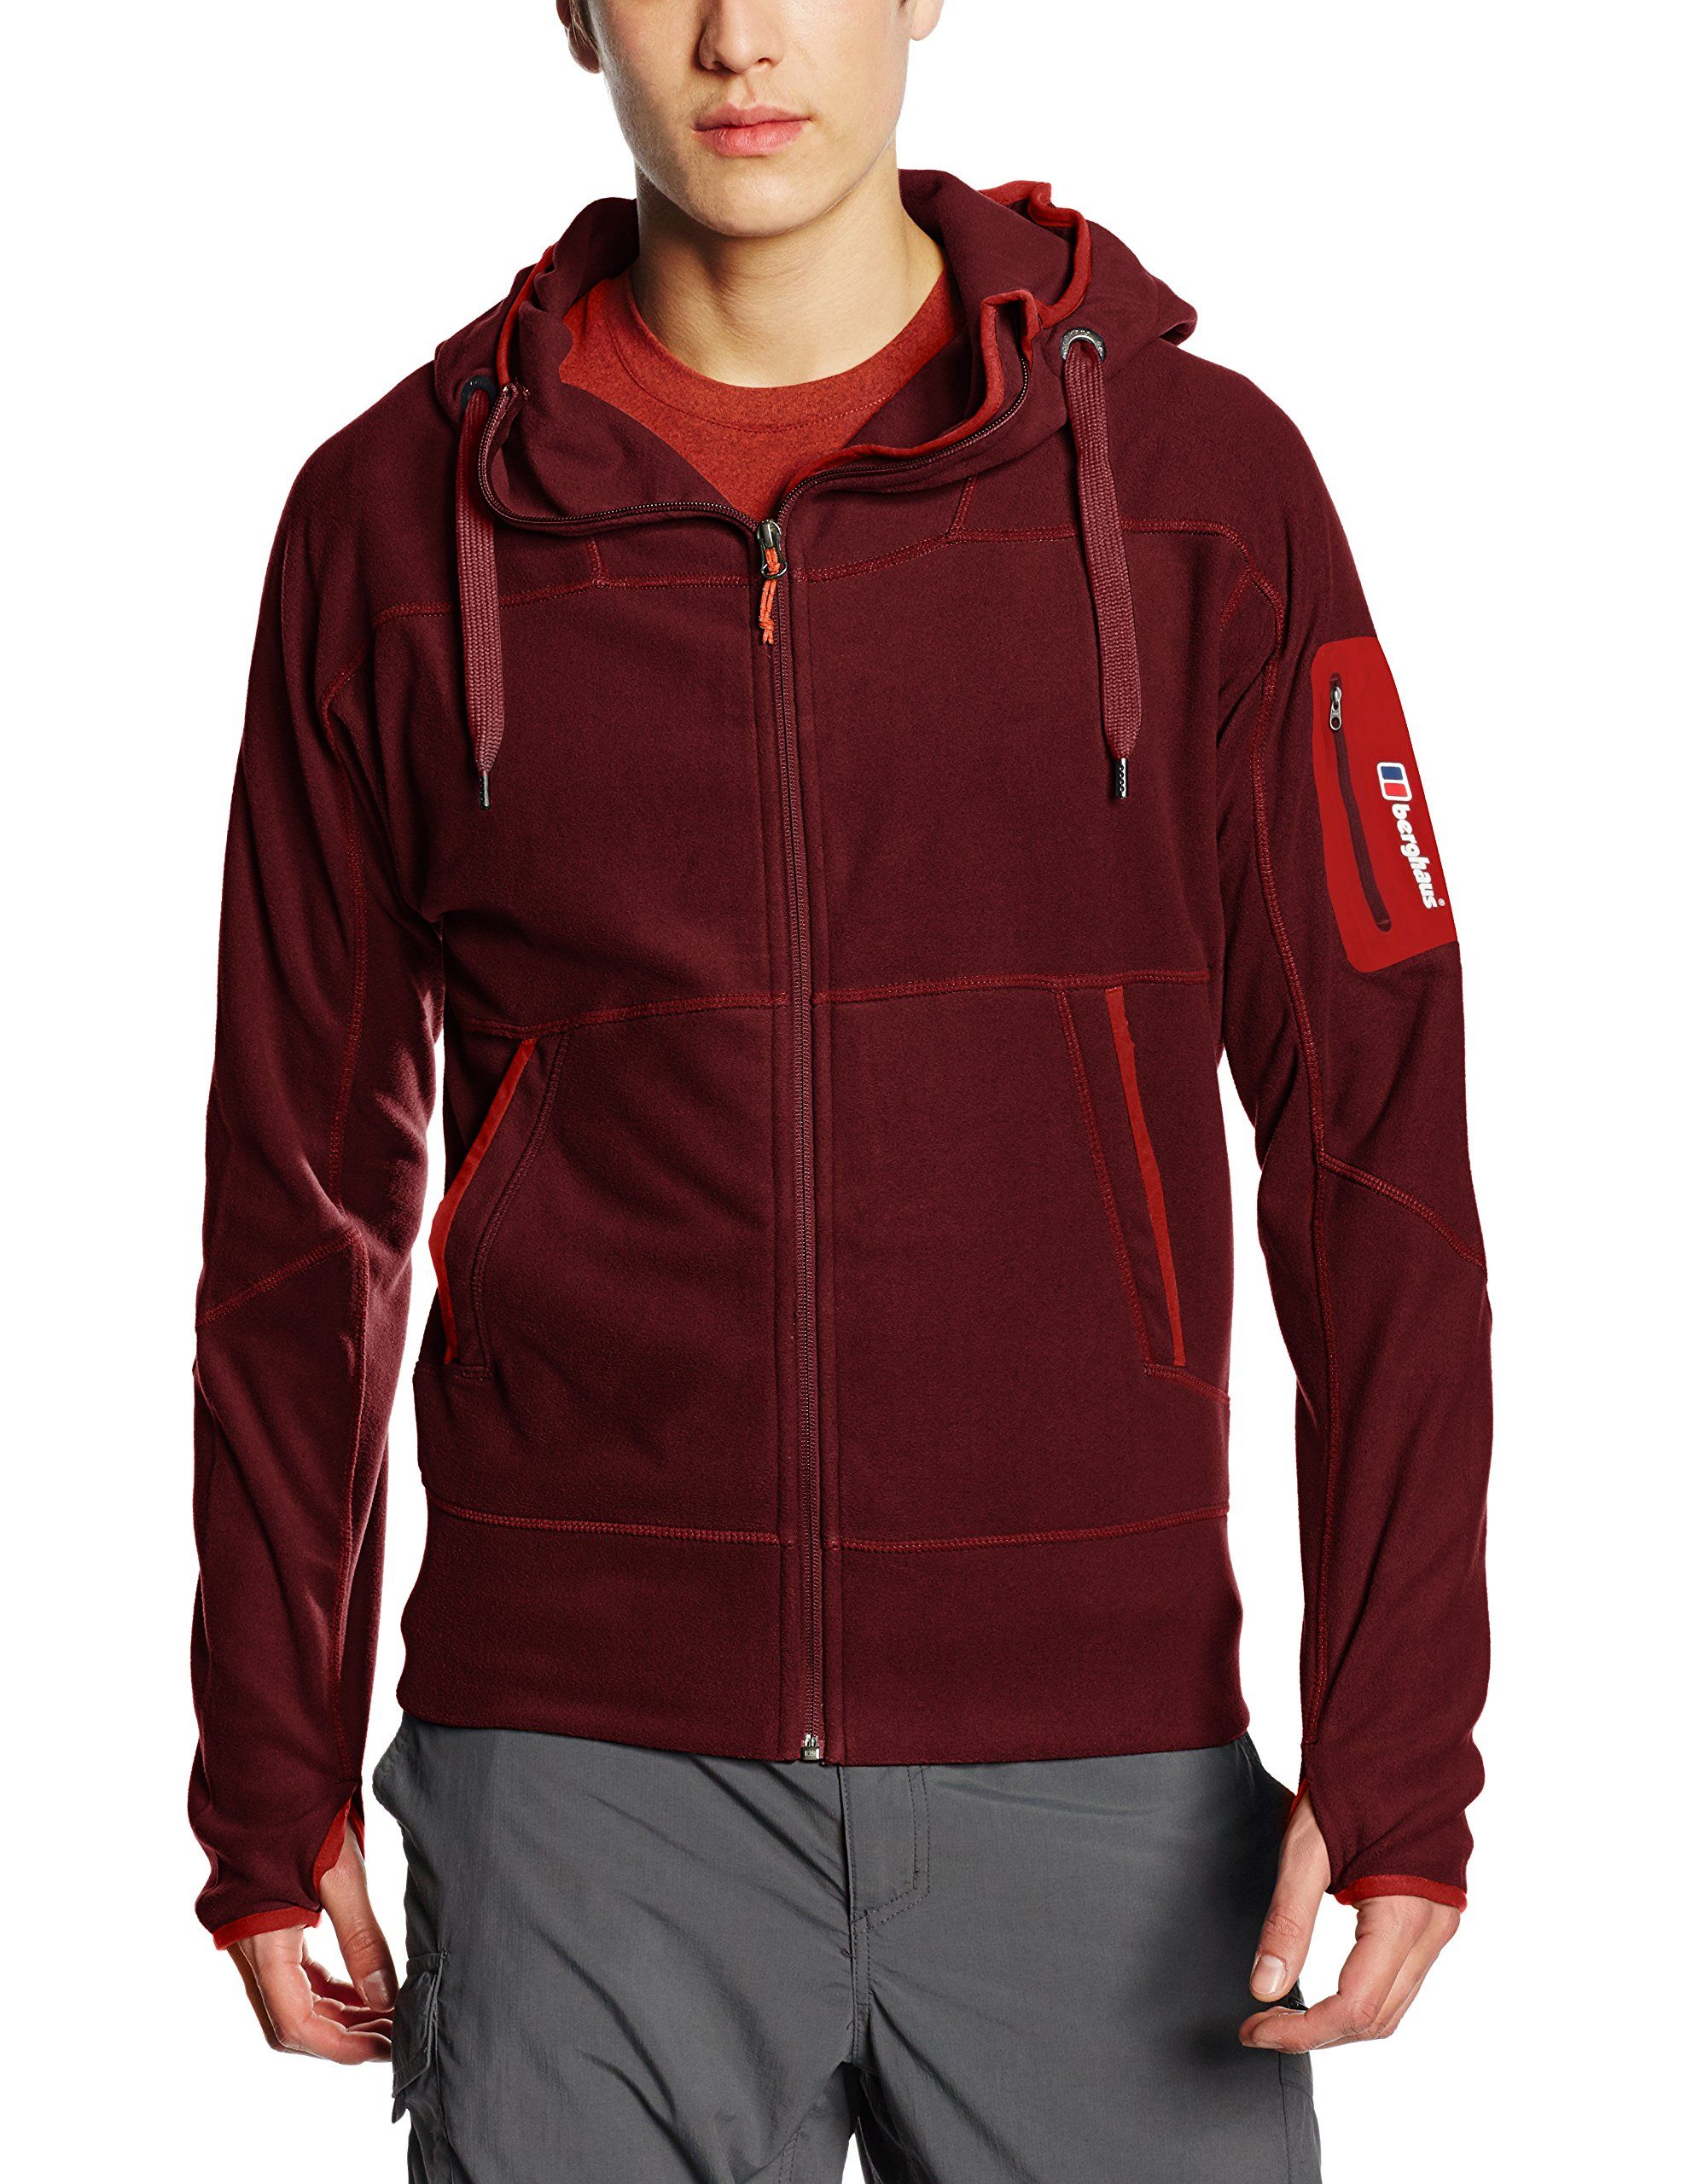 Berghaus mens berghaus mens verdon hoody full zip fleece jacket red